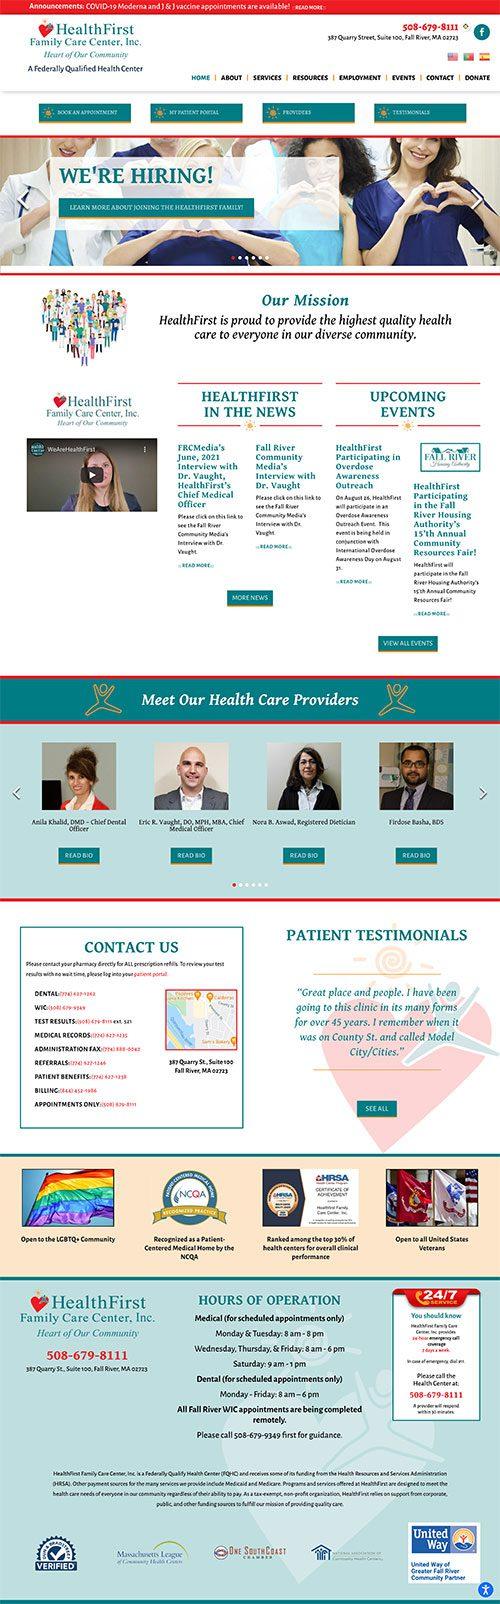 HealthFirst Family Care Center, Inc. - Fall River, MA